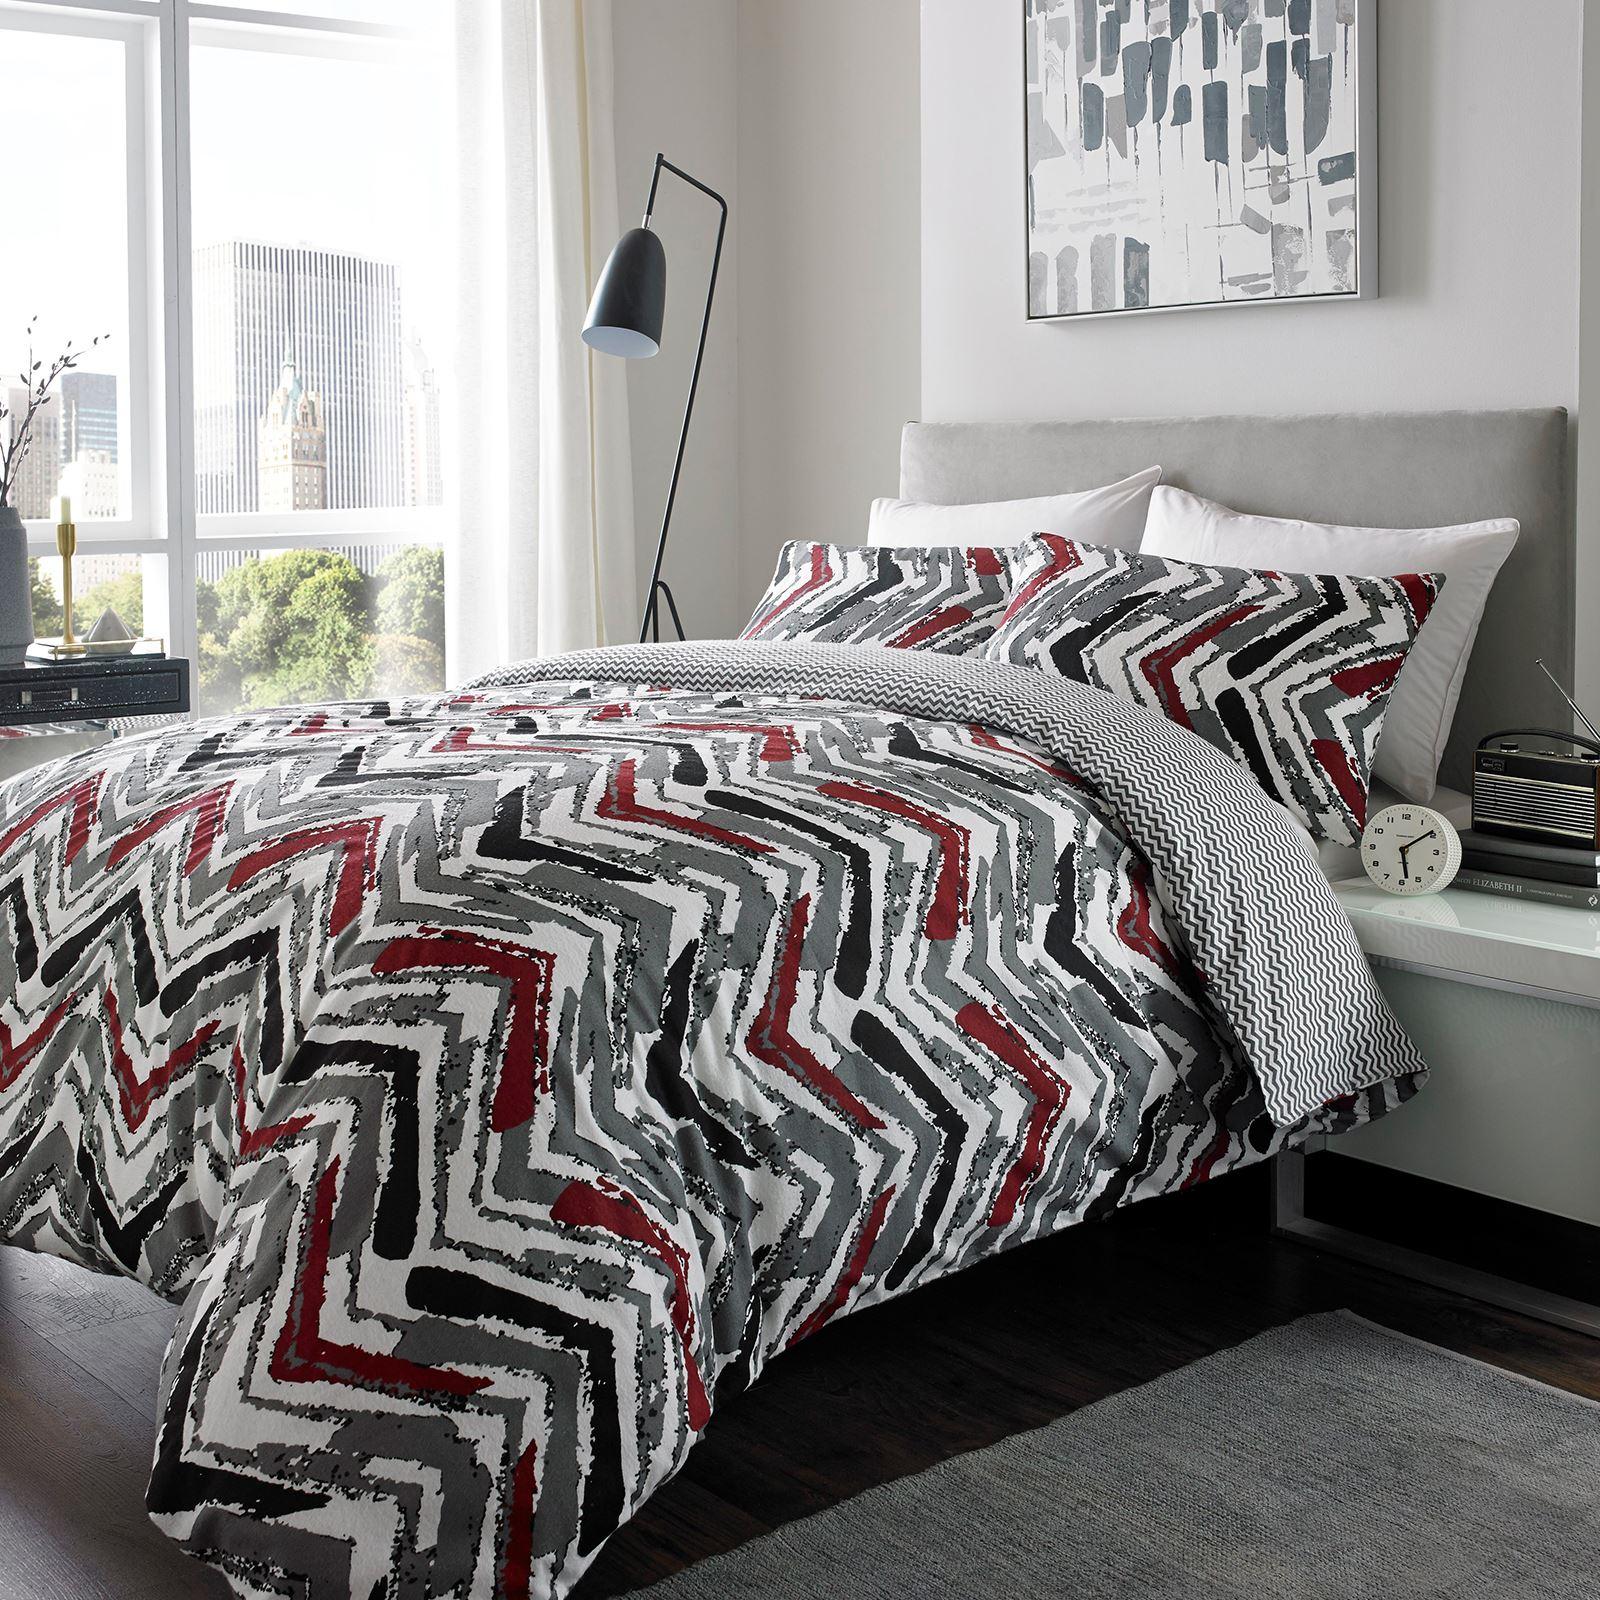 Flannelette 100 Brushed Cotton Duvet Quilt Cover Bedding